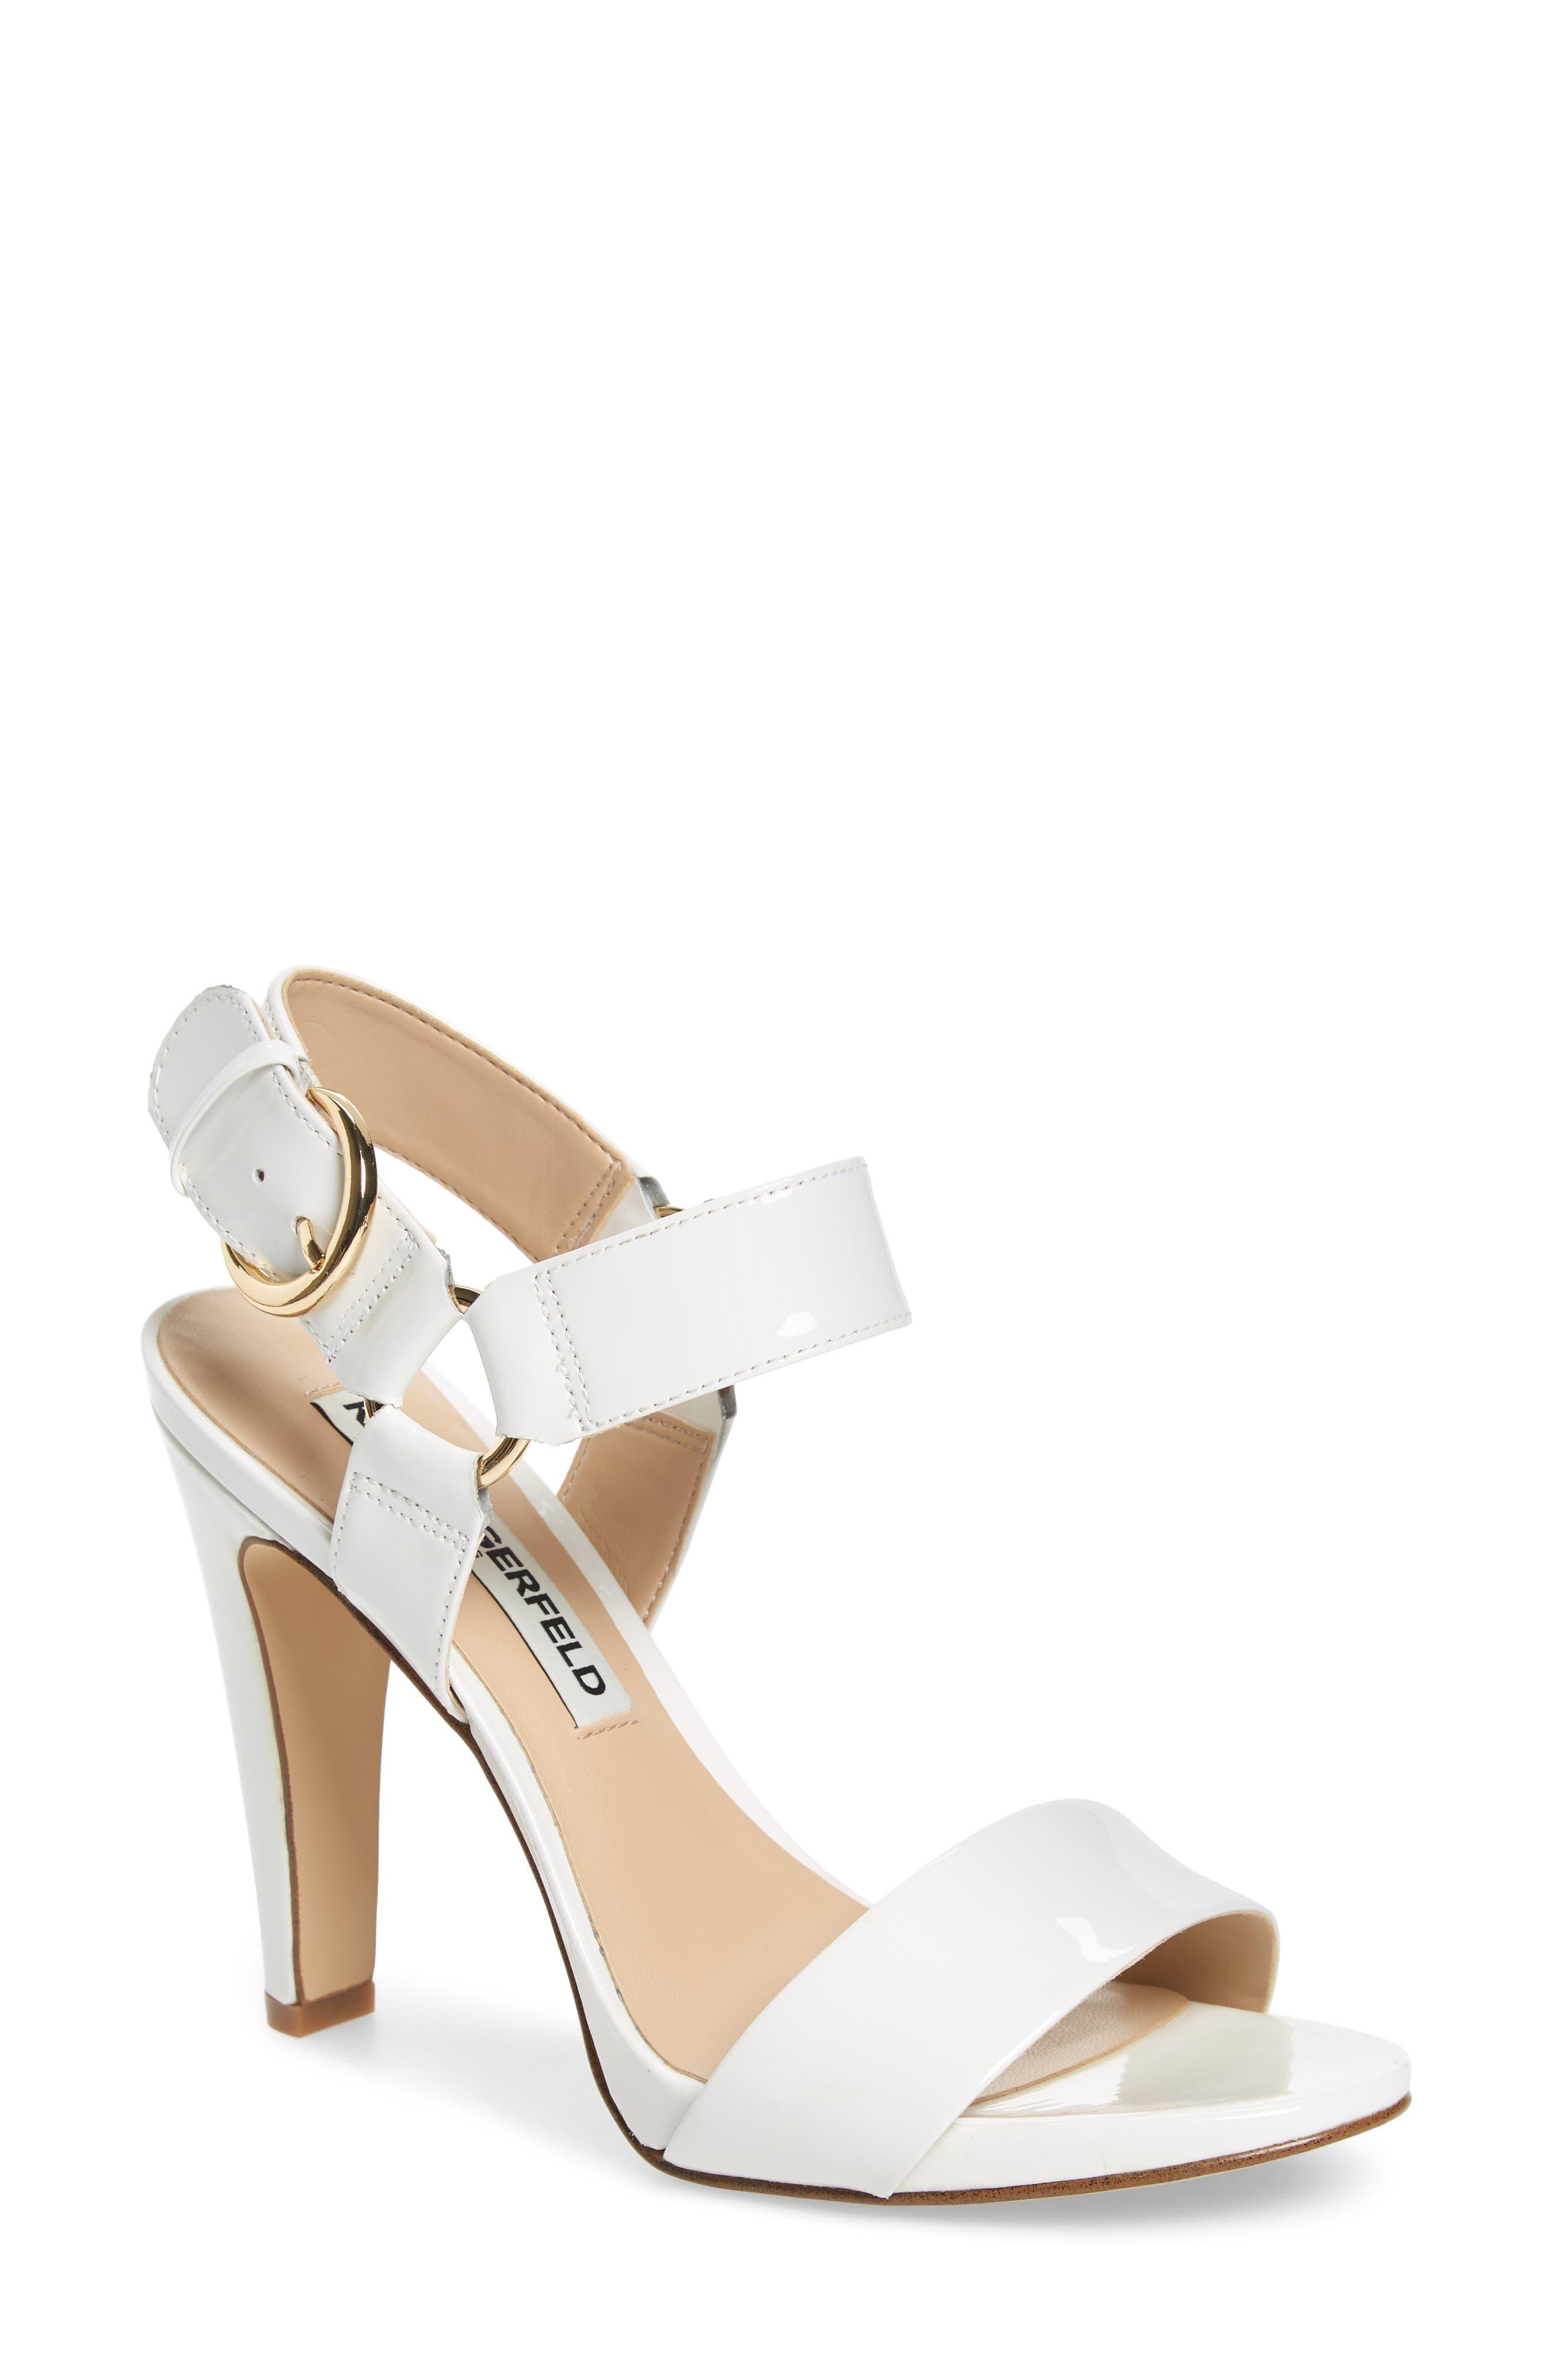 KARL LAGERFELD PARIS Cieone Sandal, Main, color, WHITE PATENT